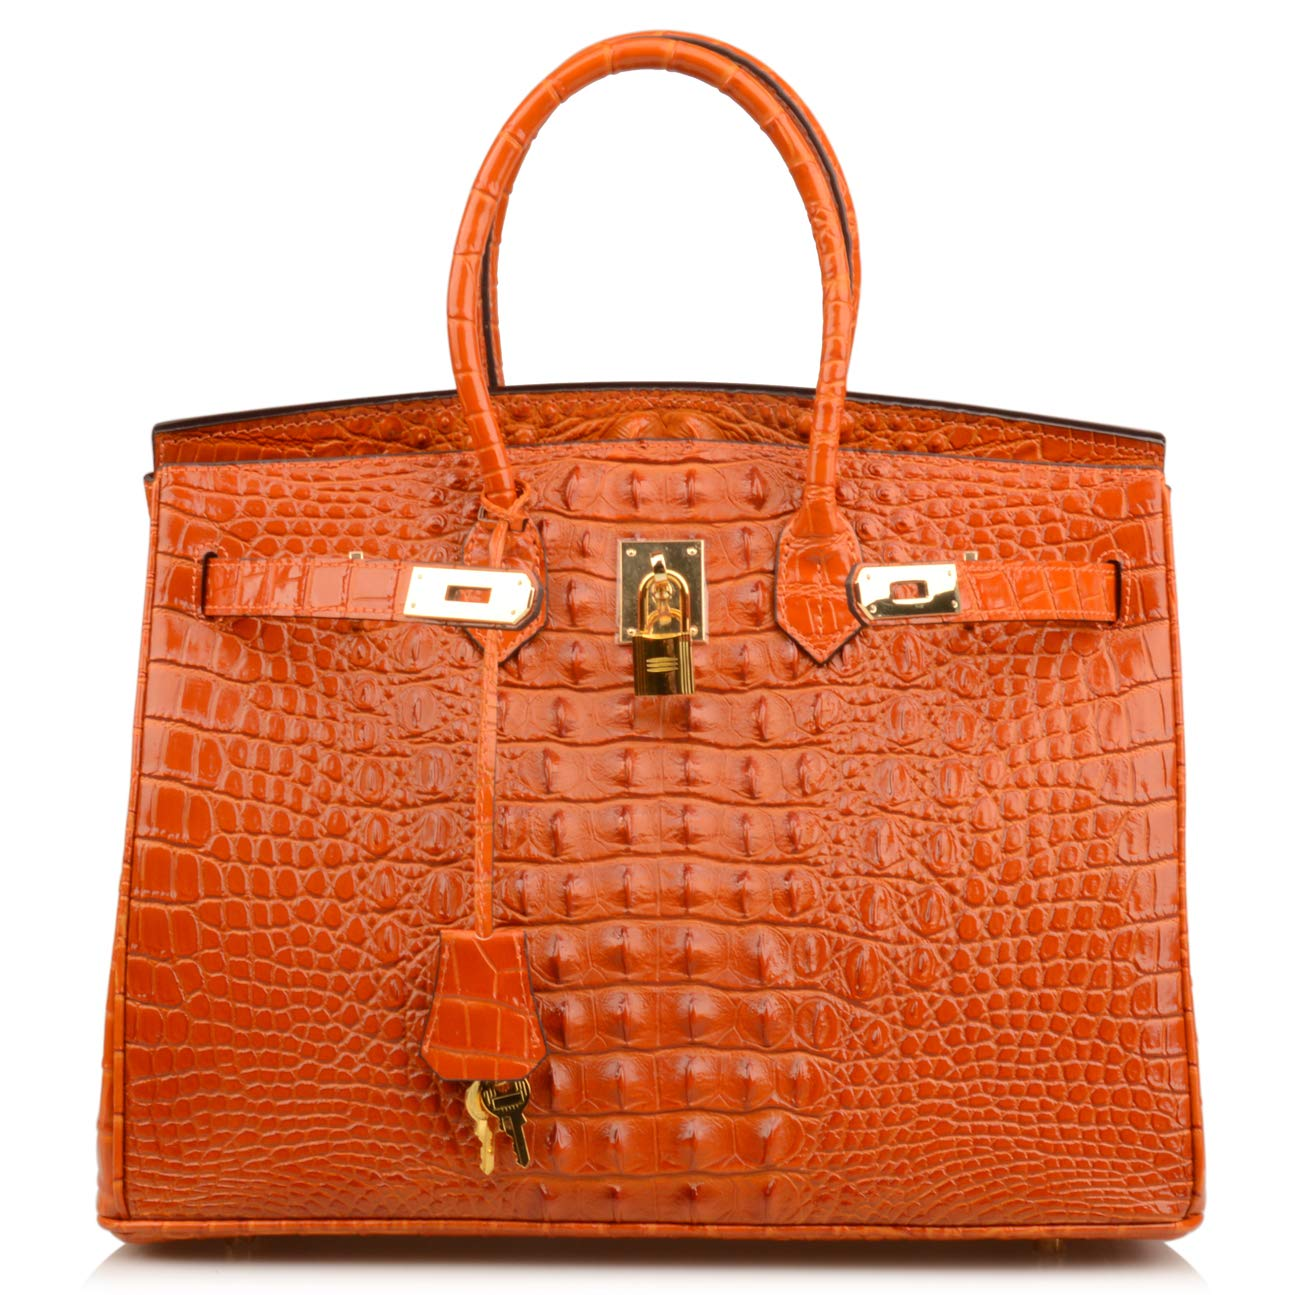 Qidell Women's Padlock Handbags Genuine Leather Crocodile Embossed Purse (13.8'' (35cm), Orange)